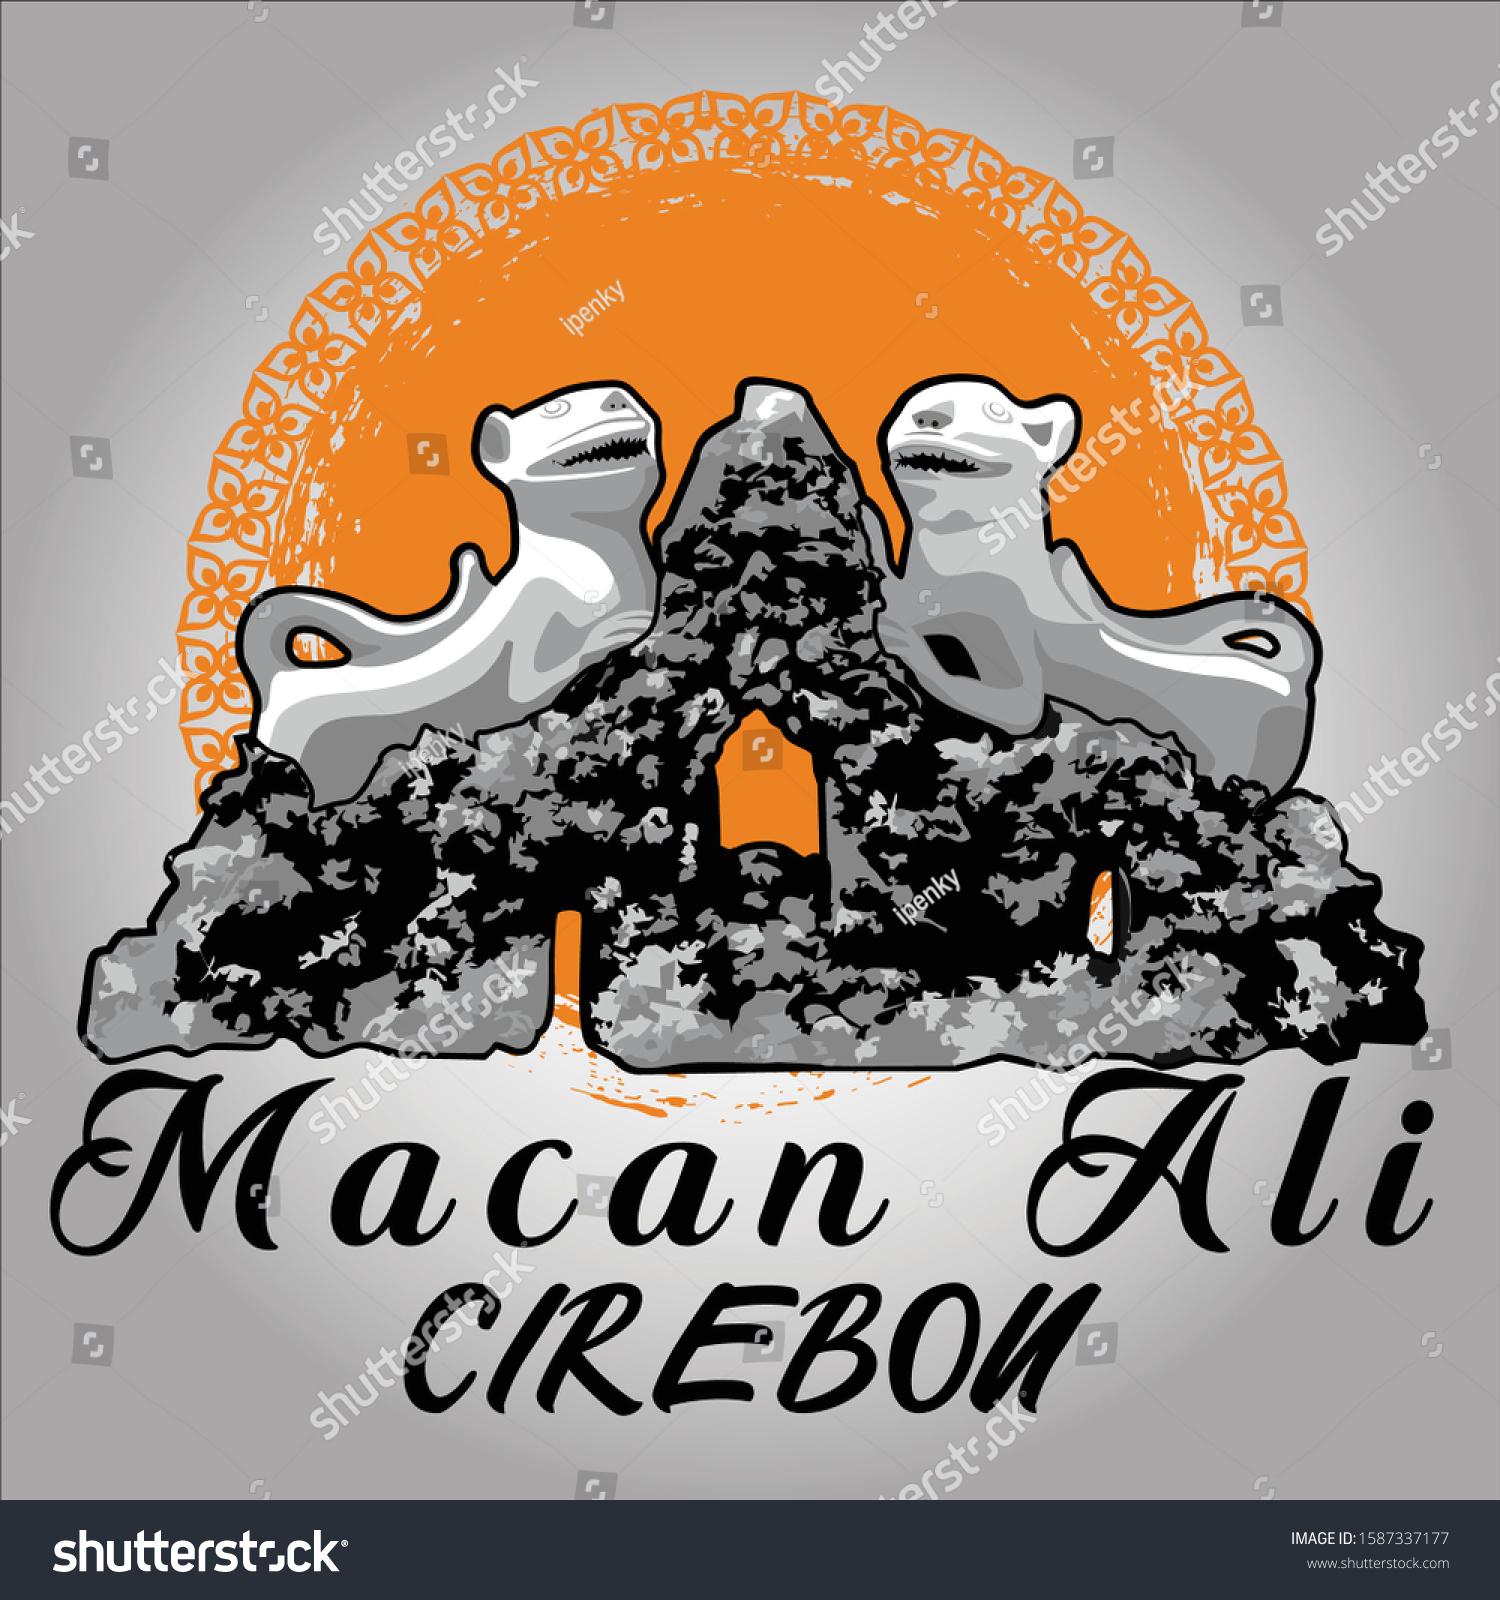 Gambar Logo Macan Ali Macan Ali Symbol Struggle Cirebon People Stock Vector Royalty Free 1587337177